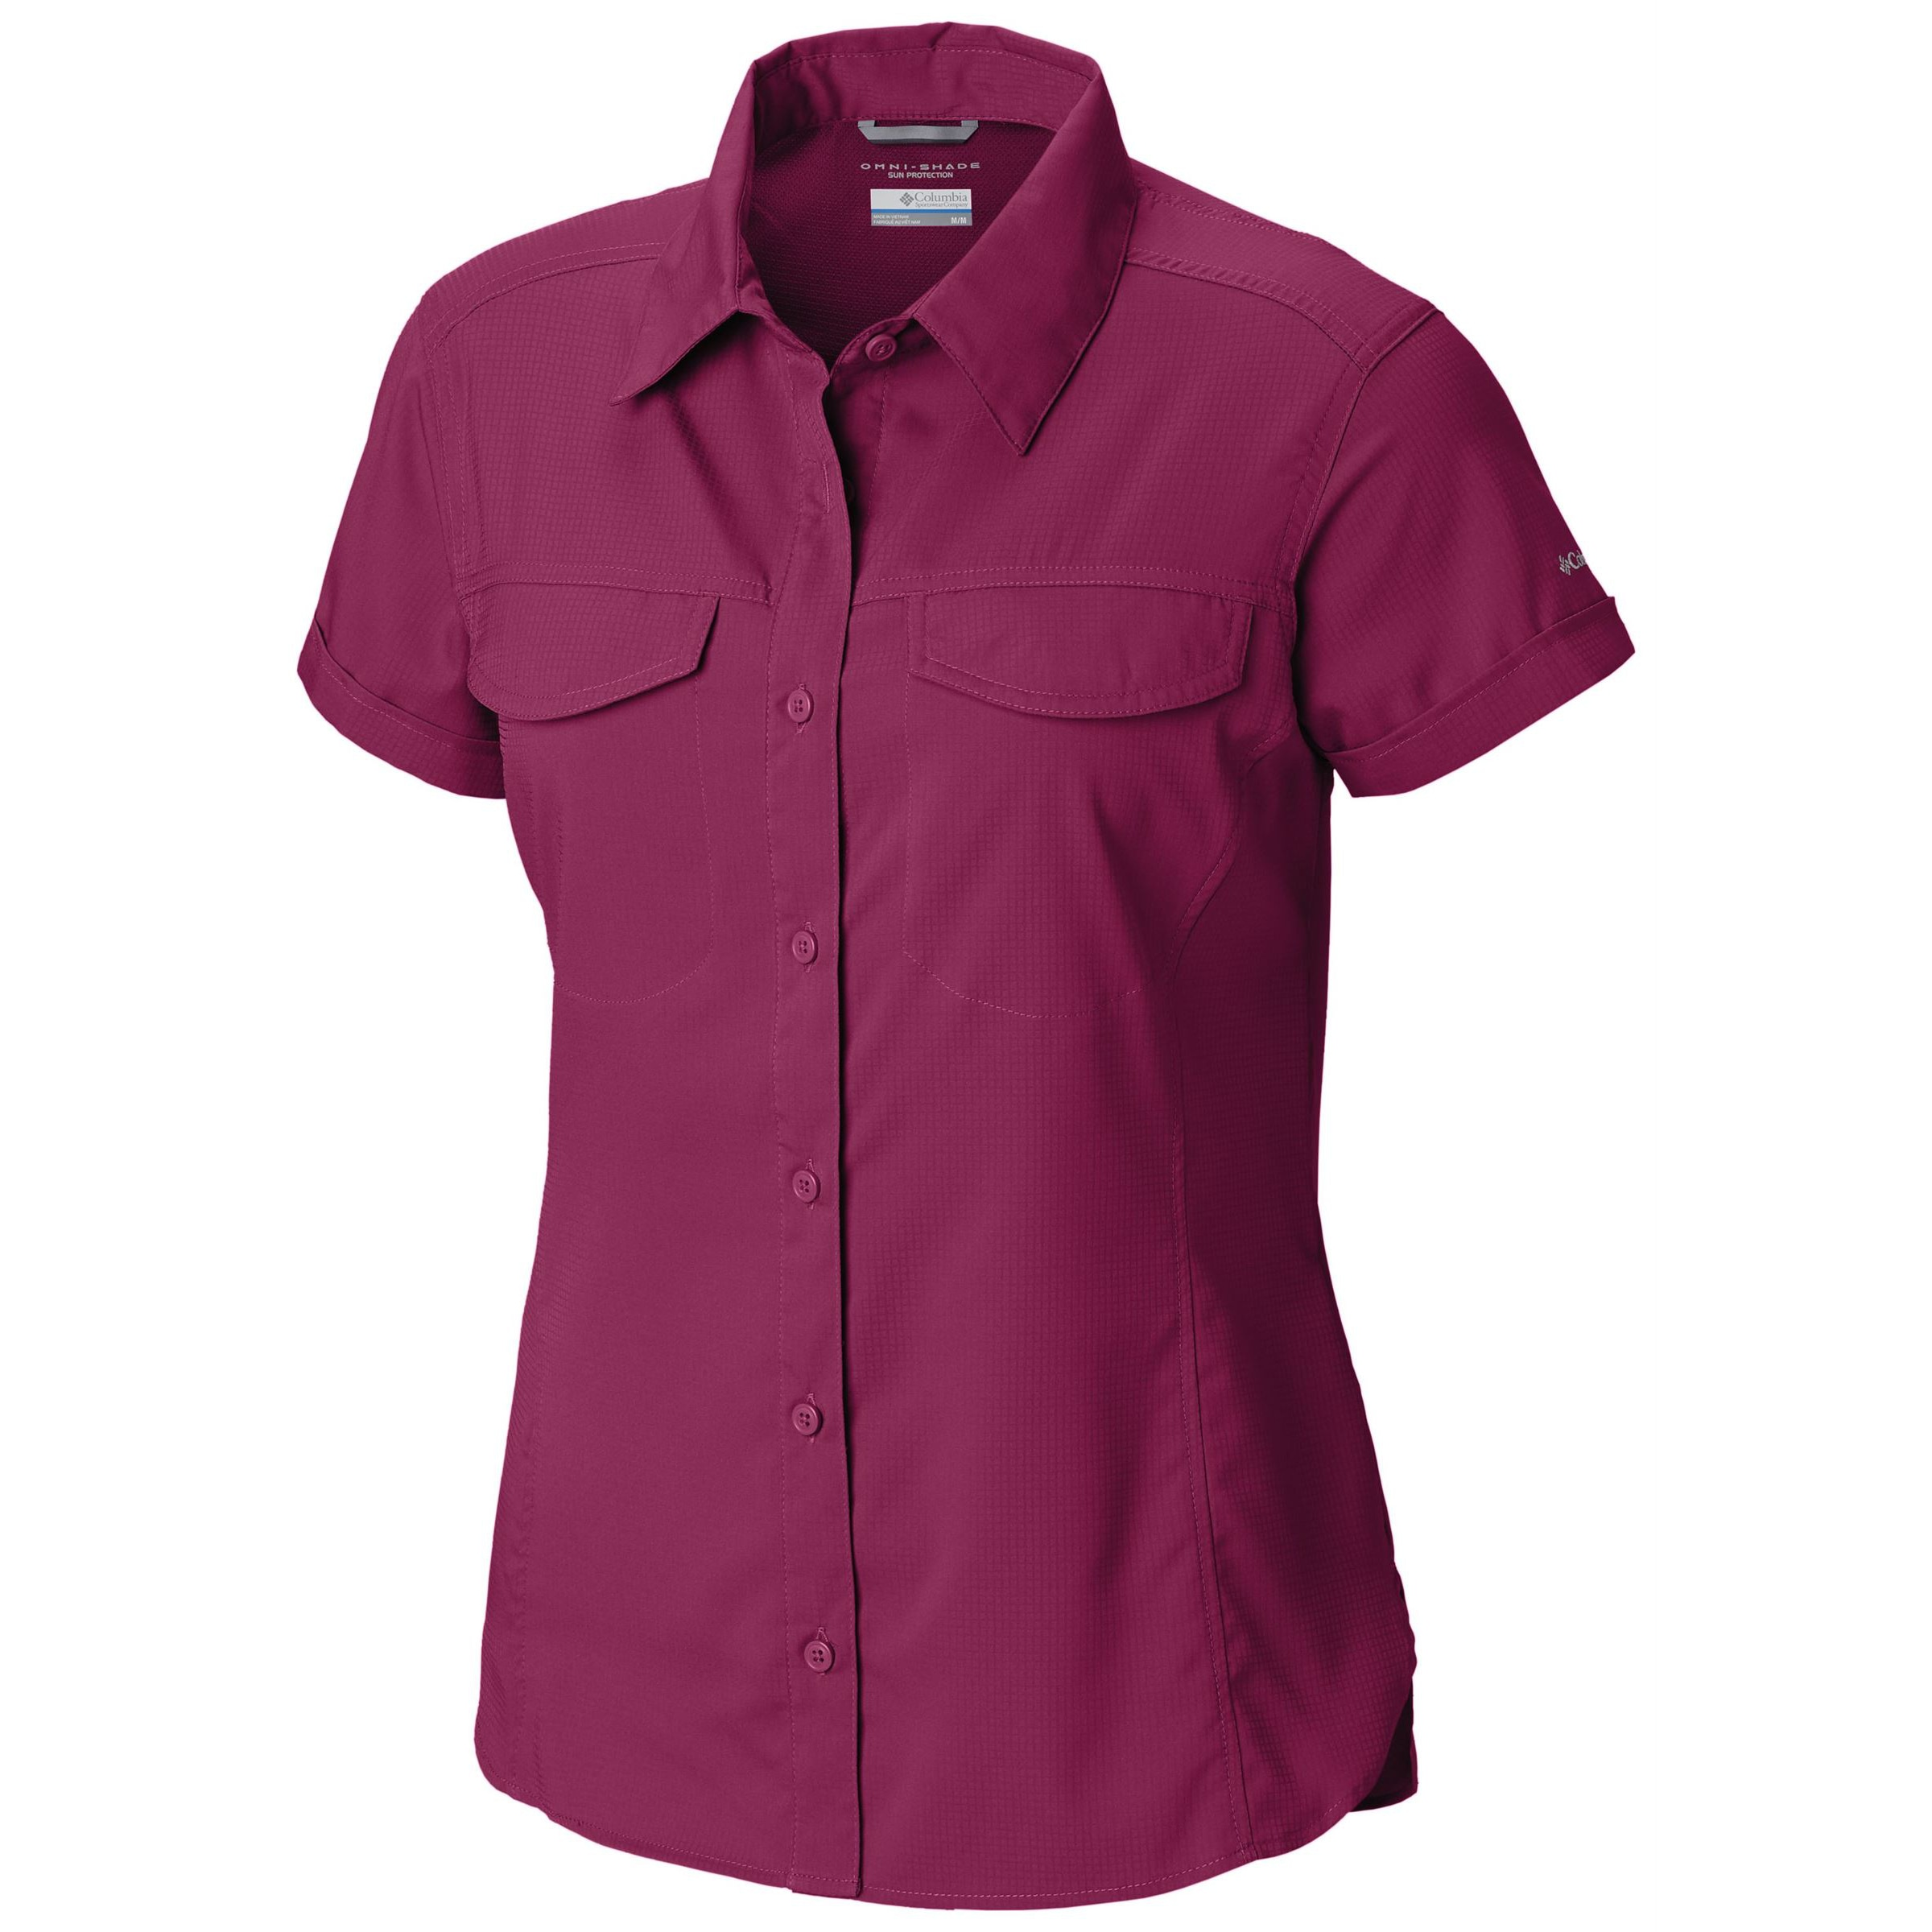 Silver Ridge Lite Shirt Short Sleeve - Women's